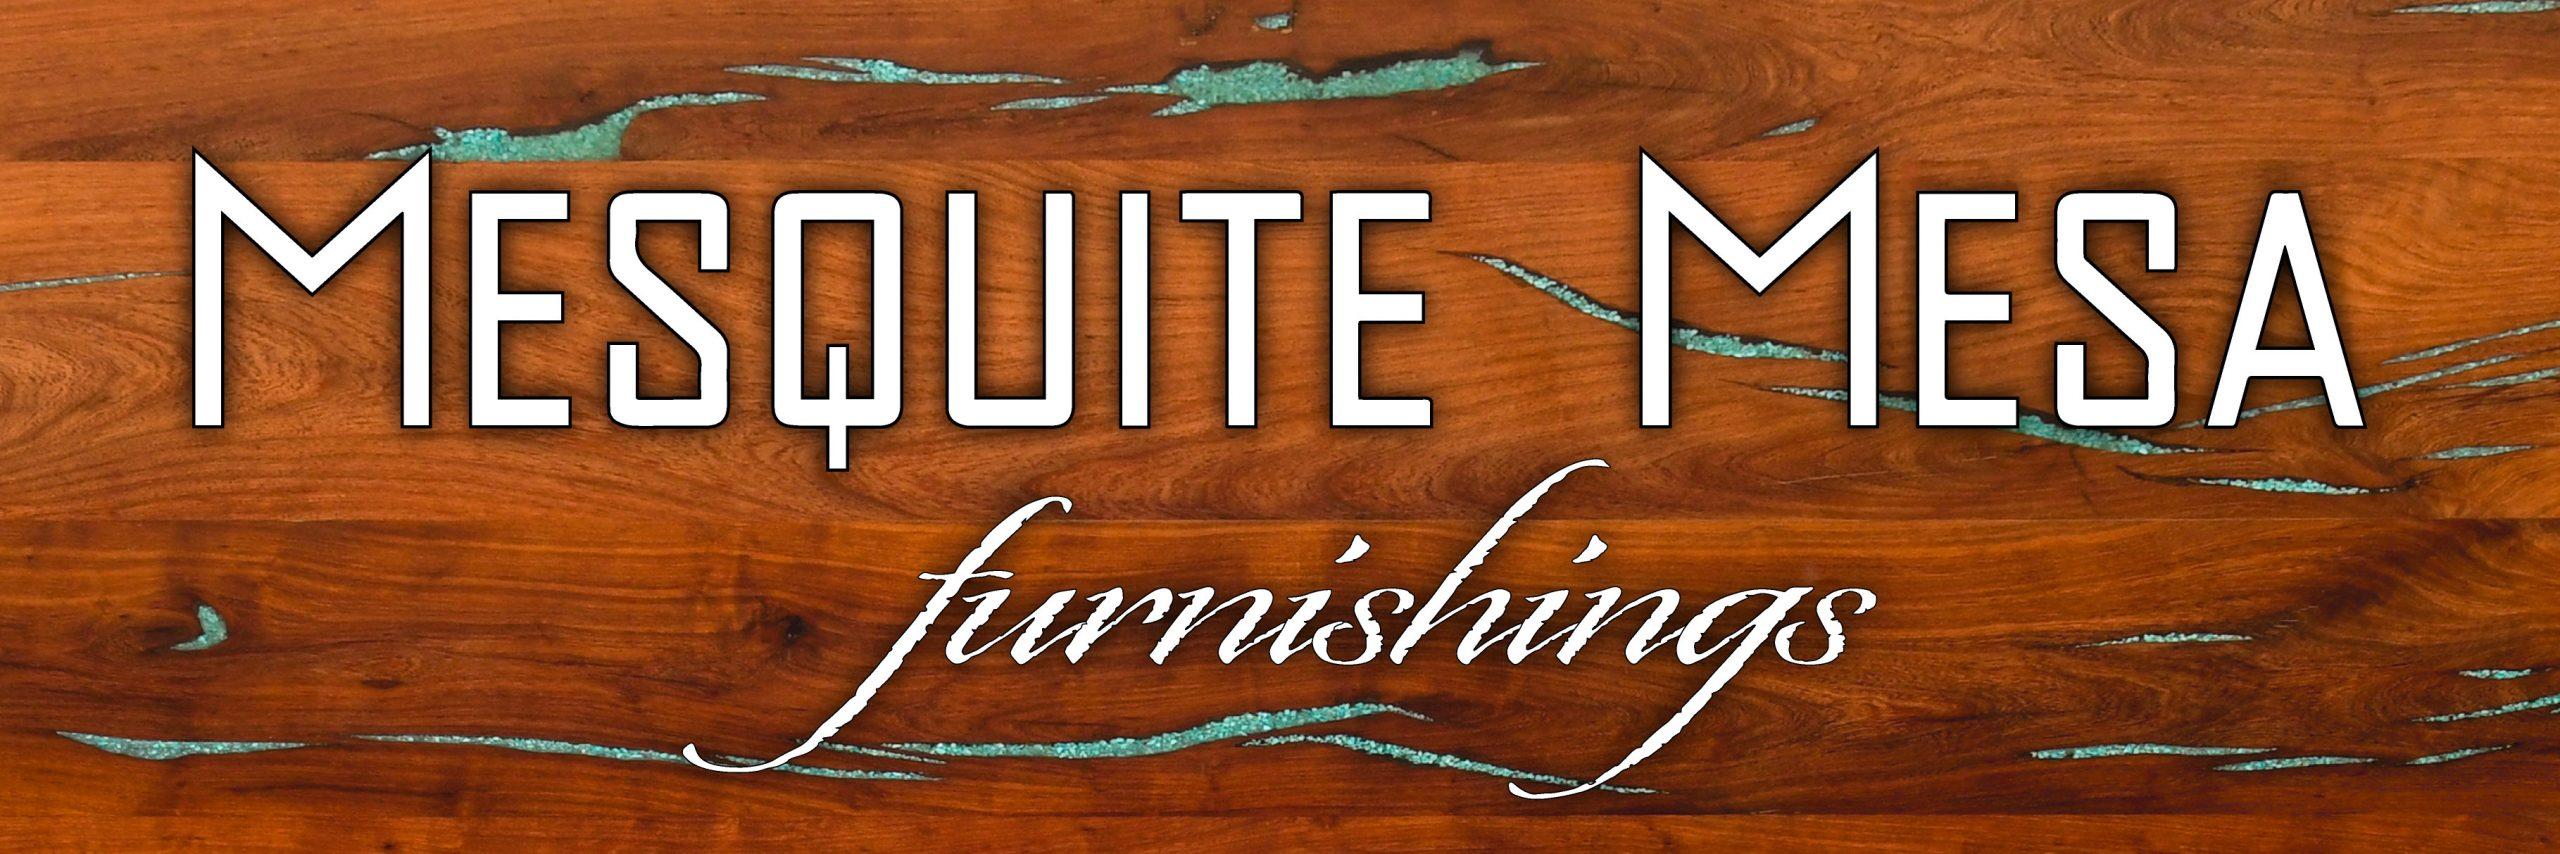 Mesquite Mesa Table Top & Logo Text | Mesquite Mesa Furnishings